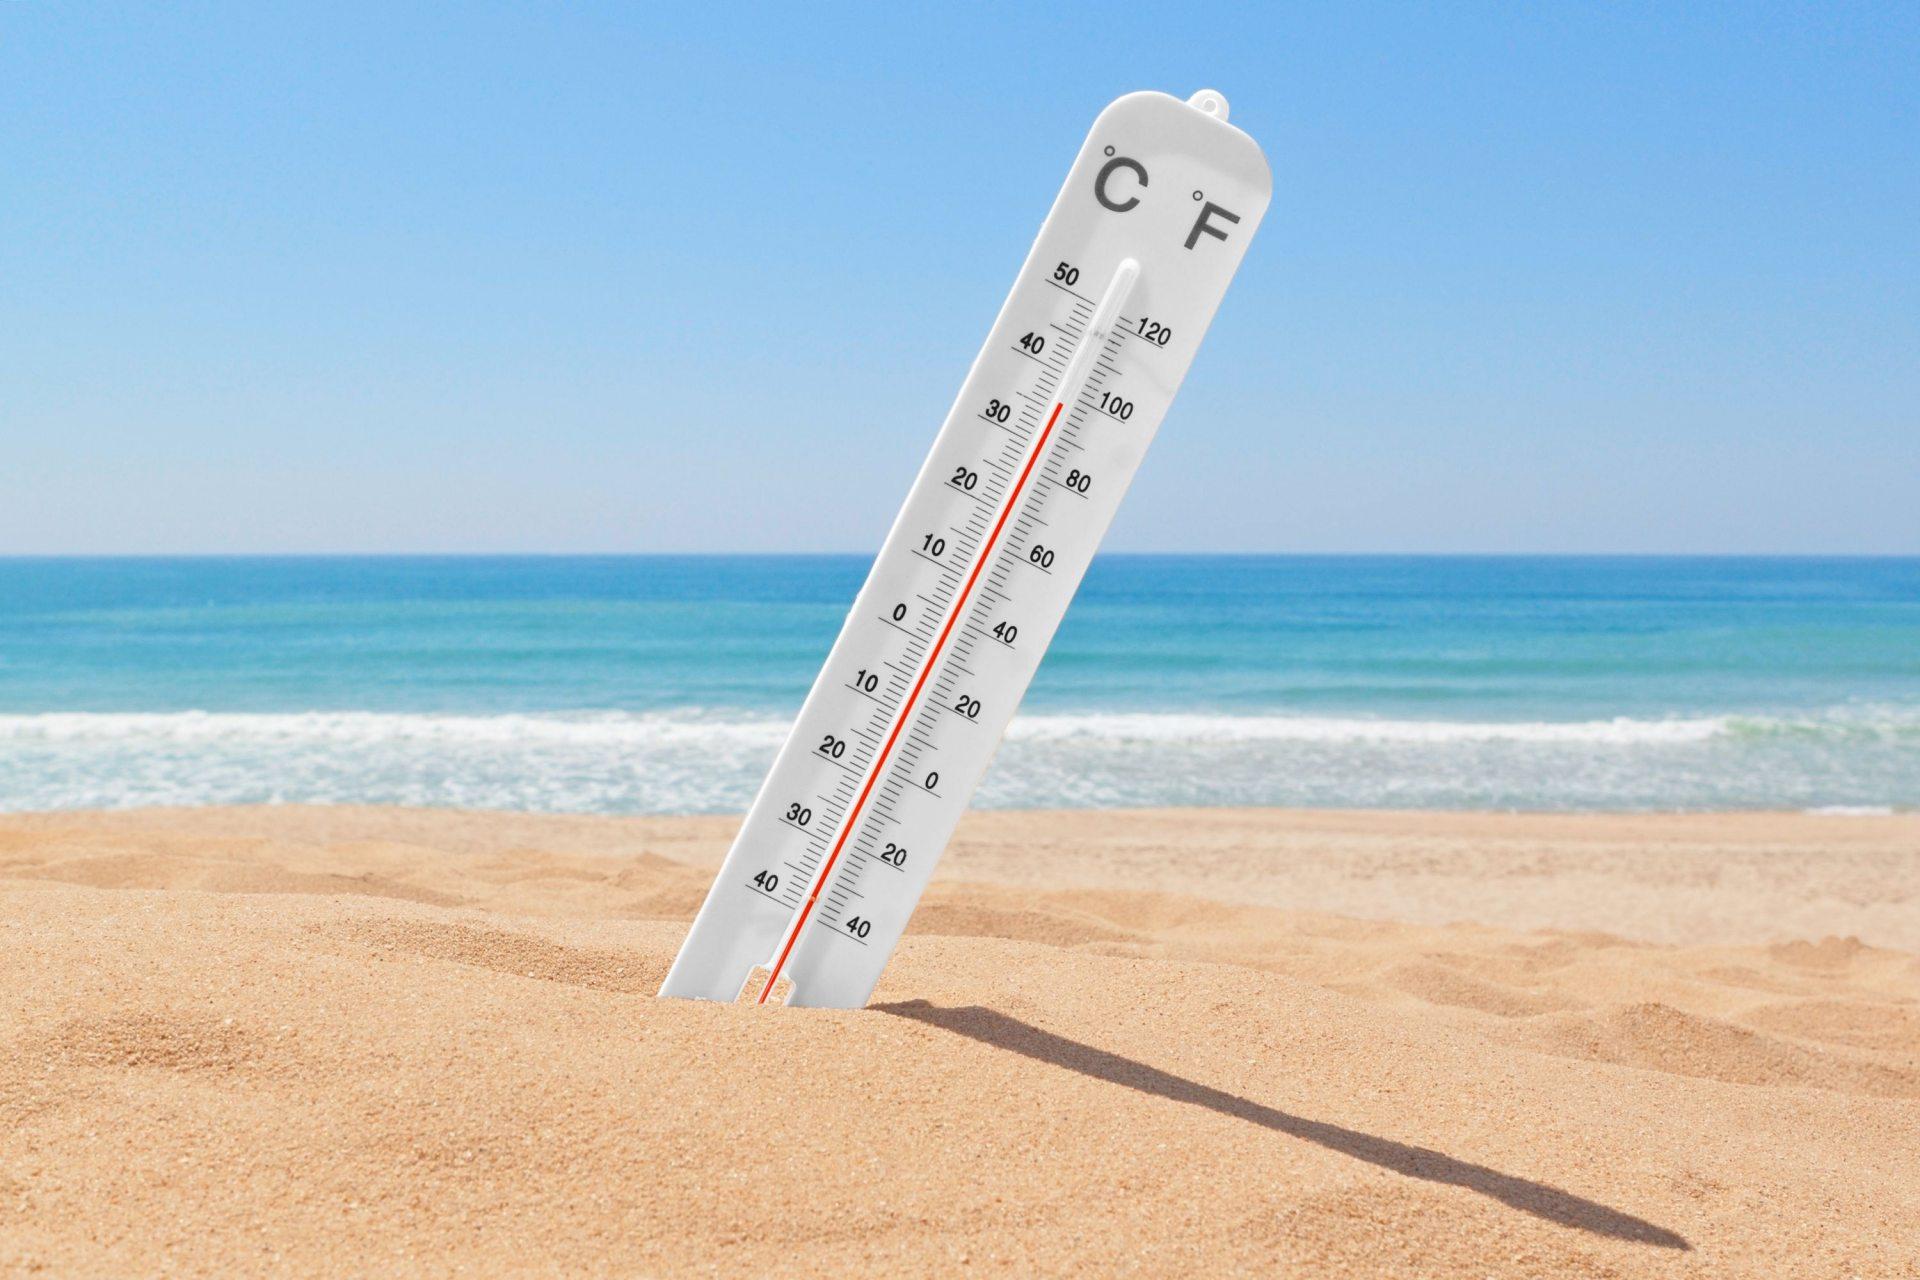 жара, солнестоягние, погода